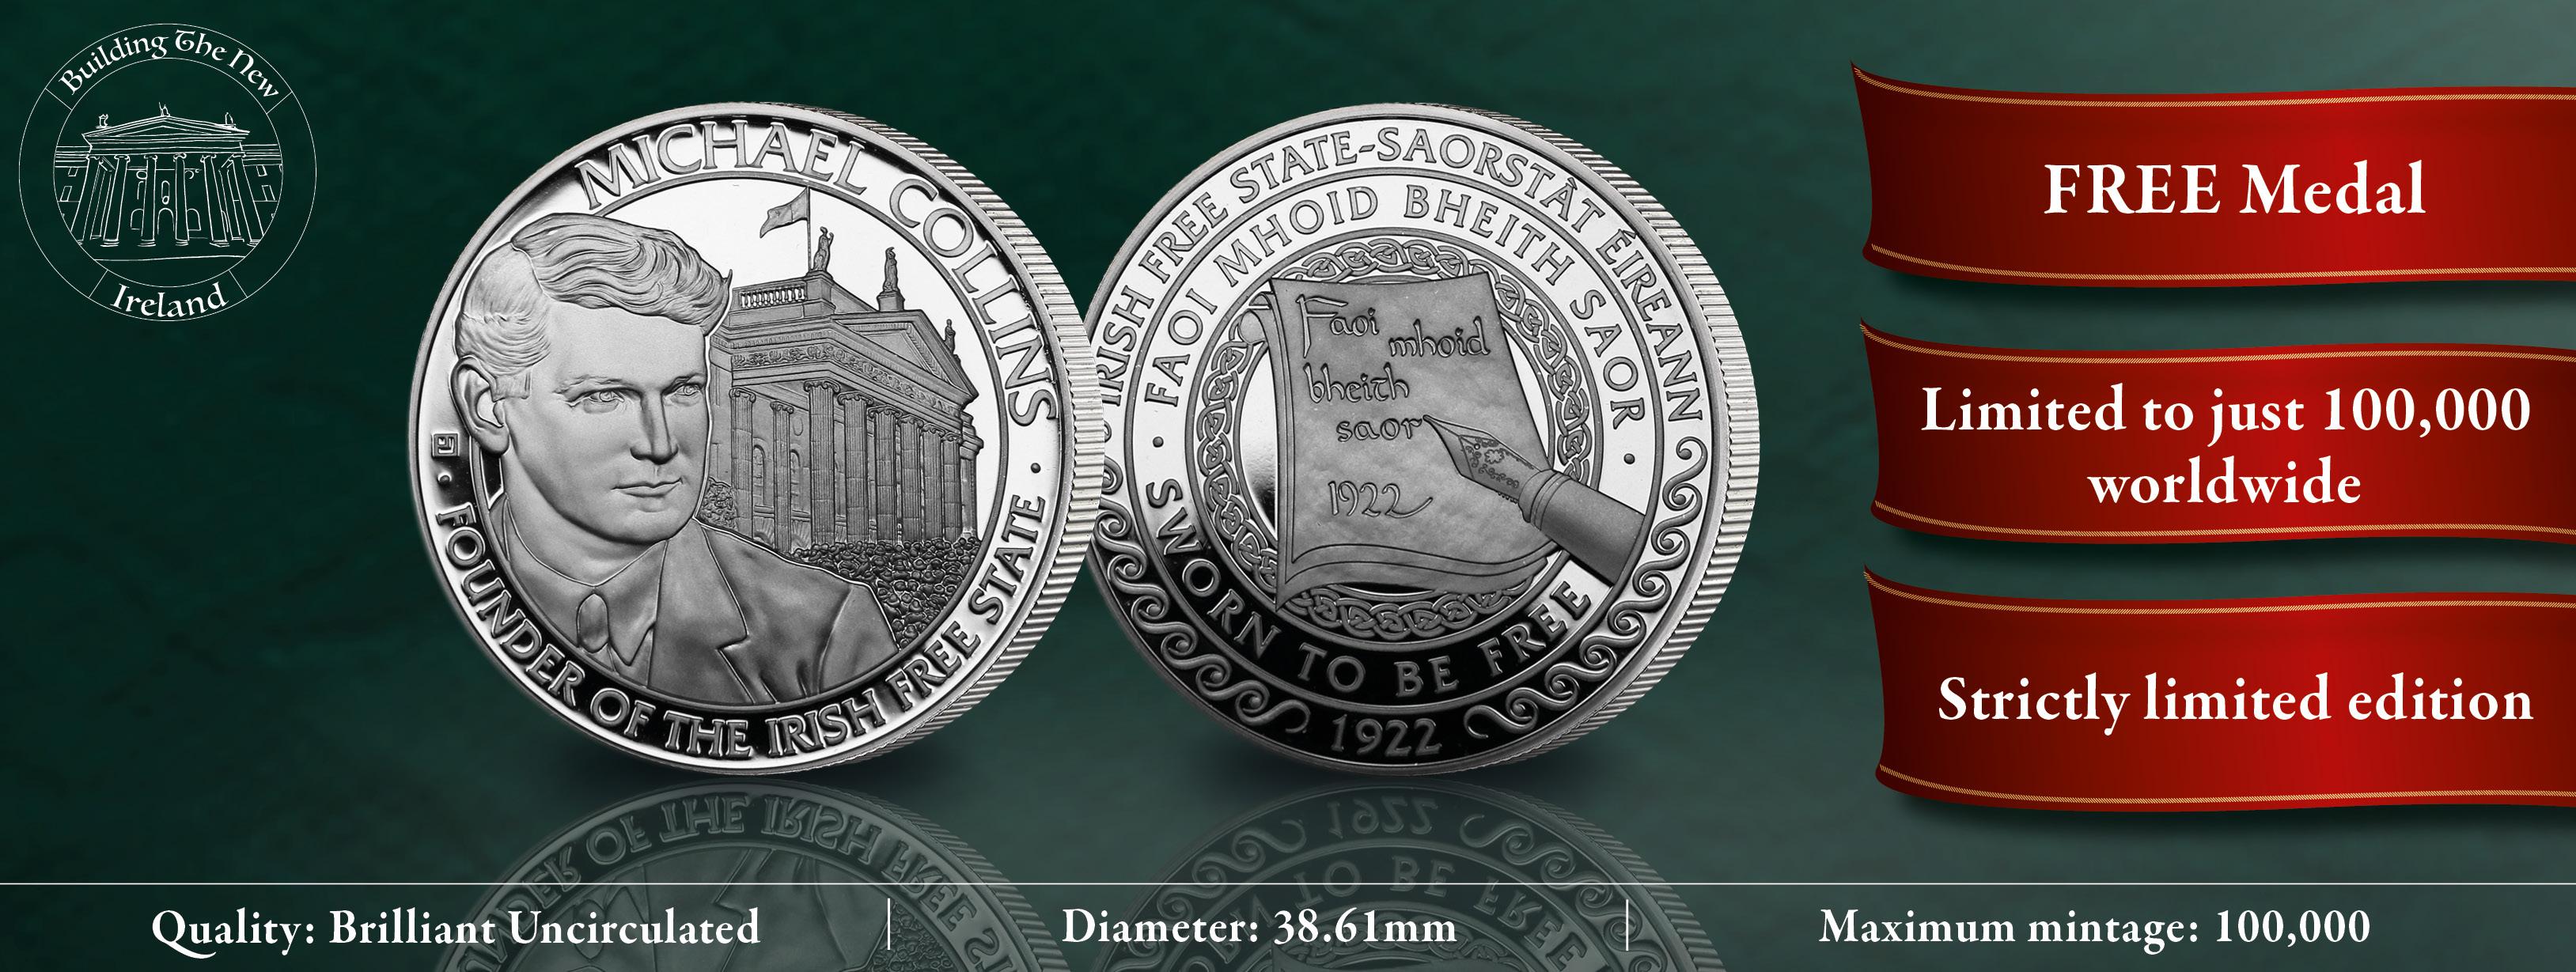 Michael Collins 80th Anniversary Commemorative Medal